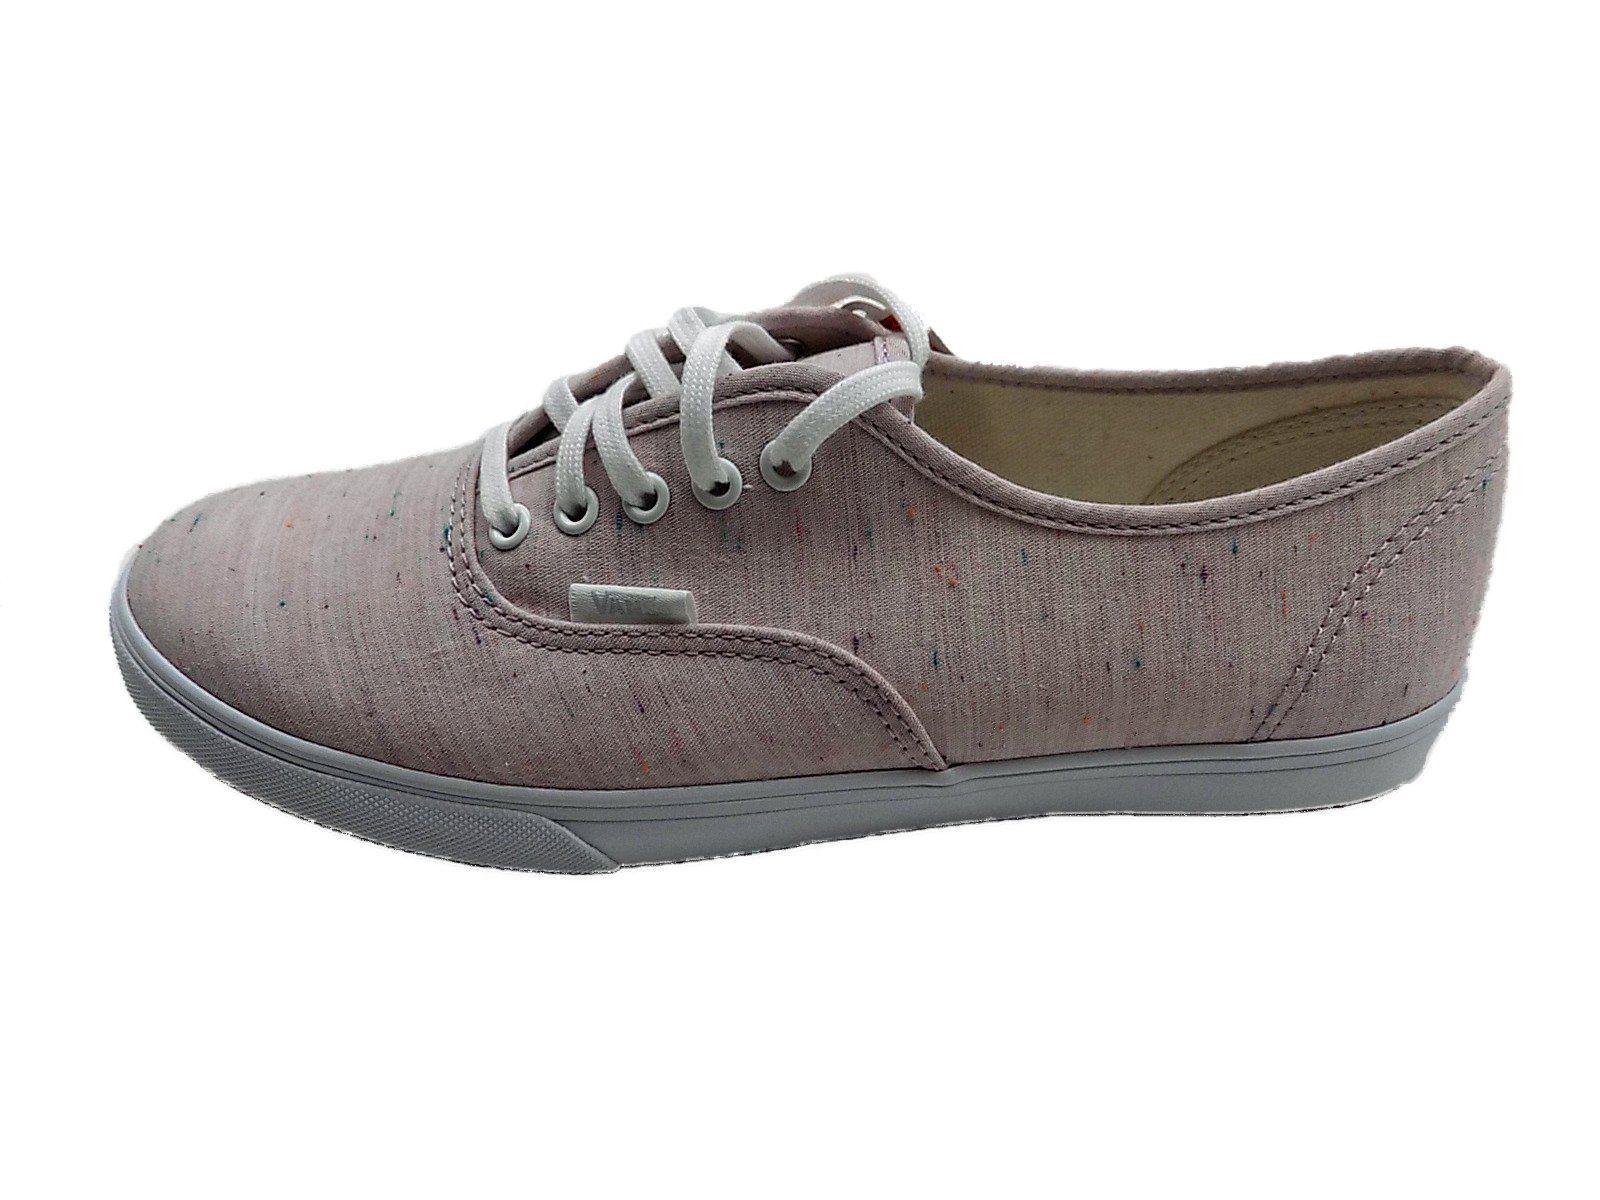 Vans Classic Authentic Lo Pro Sneakers (7.0 D(M) US Mens/ 8.5 B(M) US Womens, (Speckle Jersey) Pink/ True White)